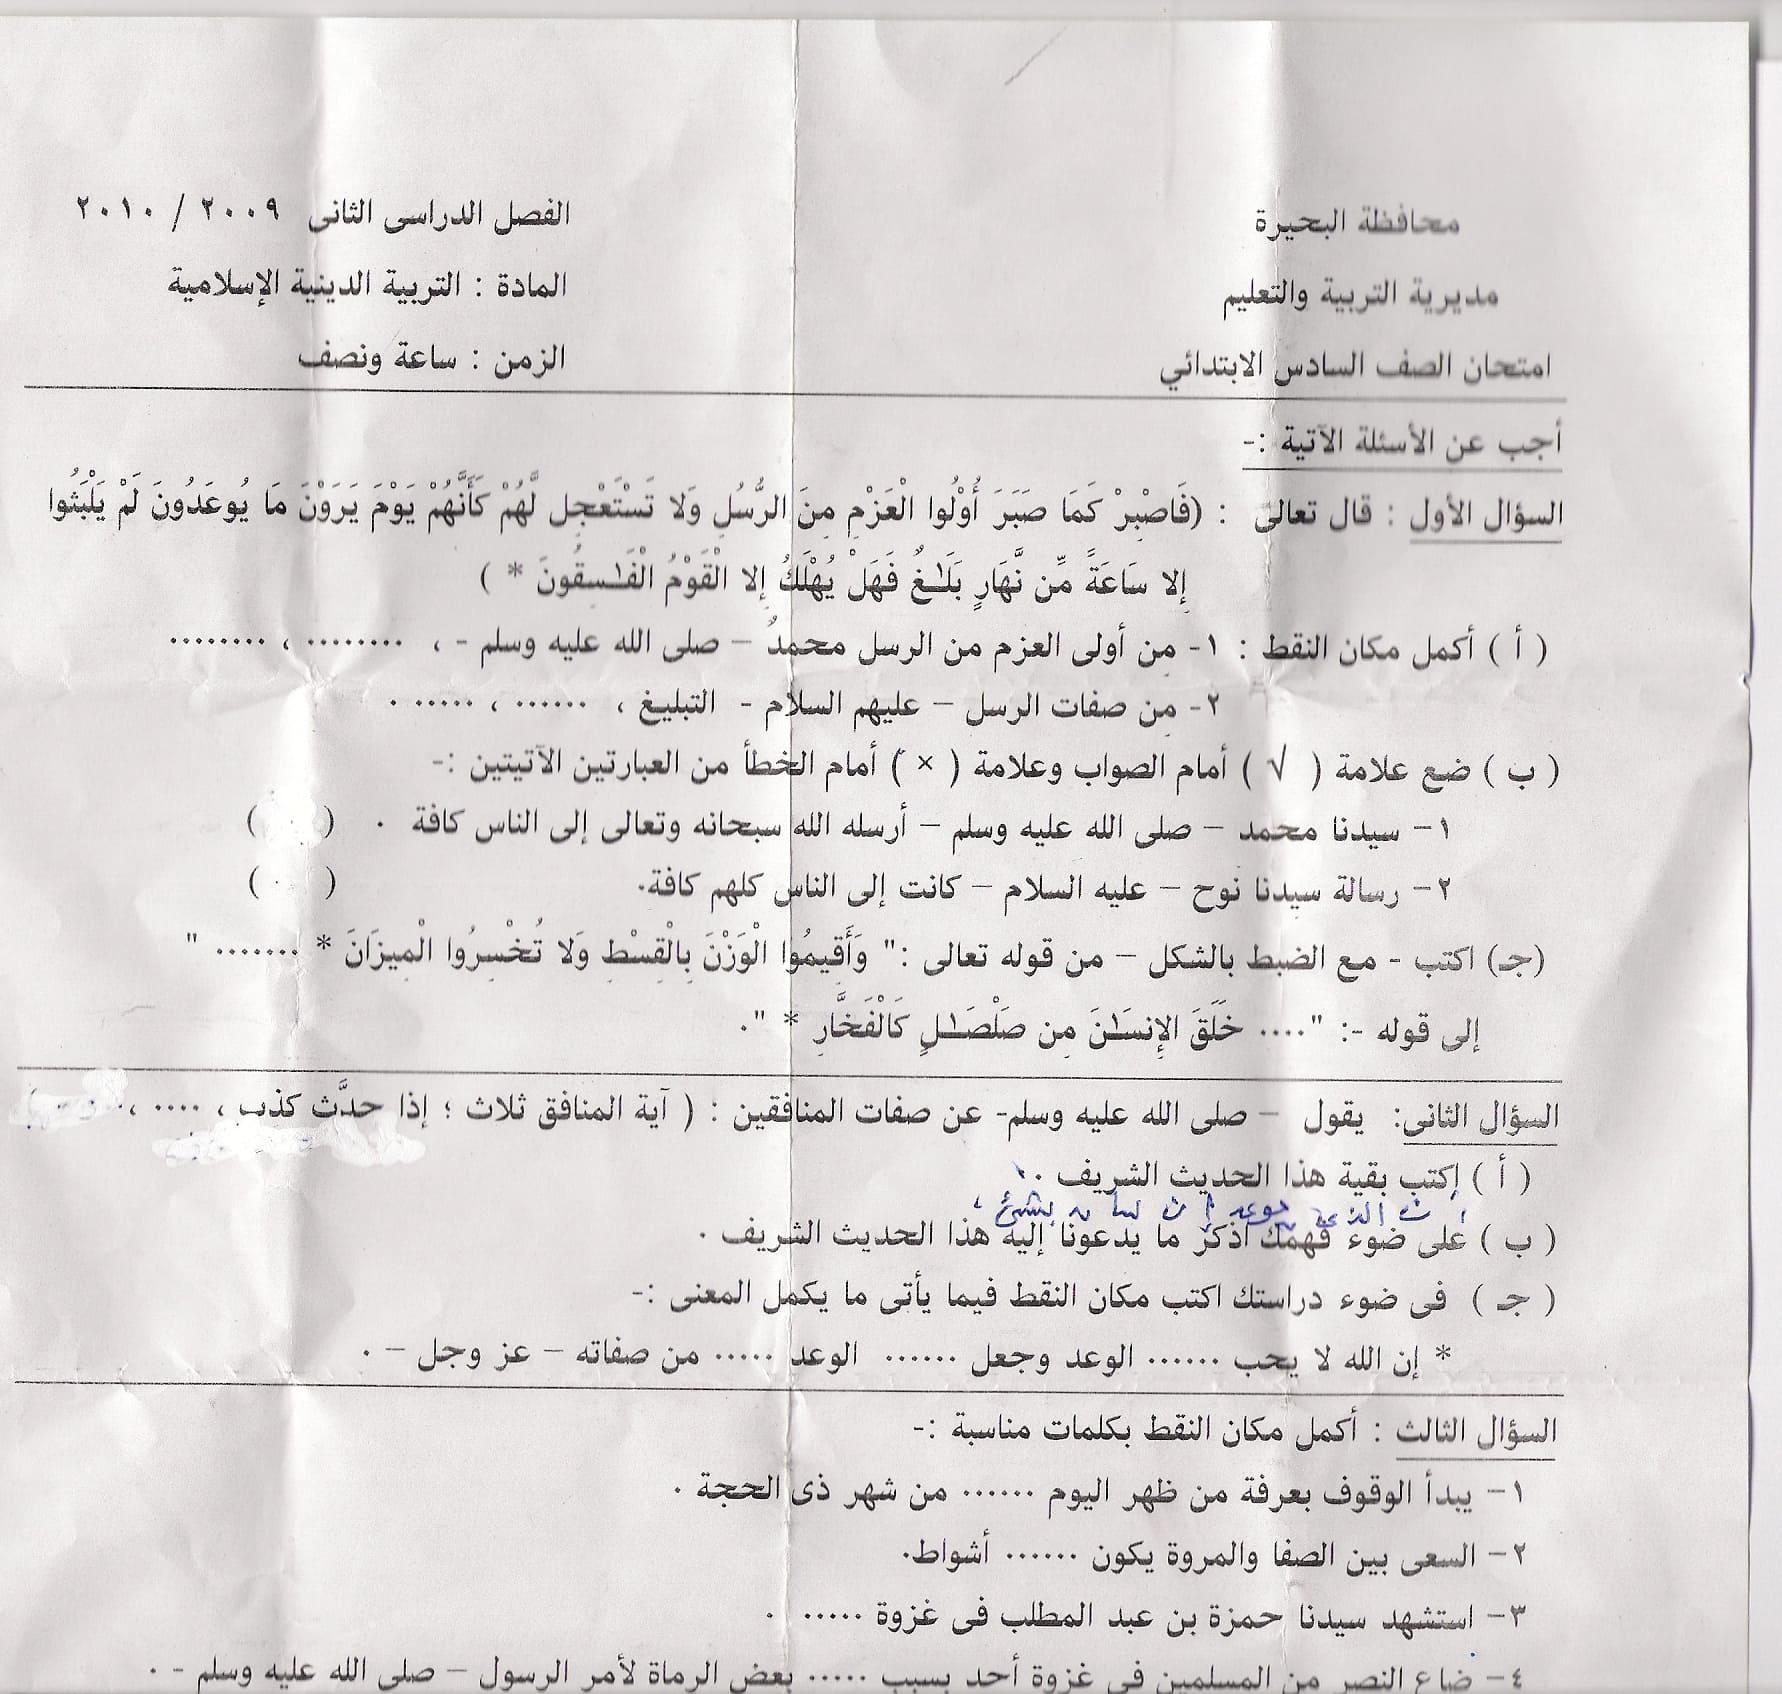 exam-eg.com_13496905891.jpg